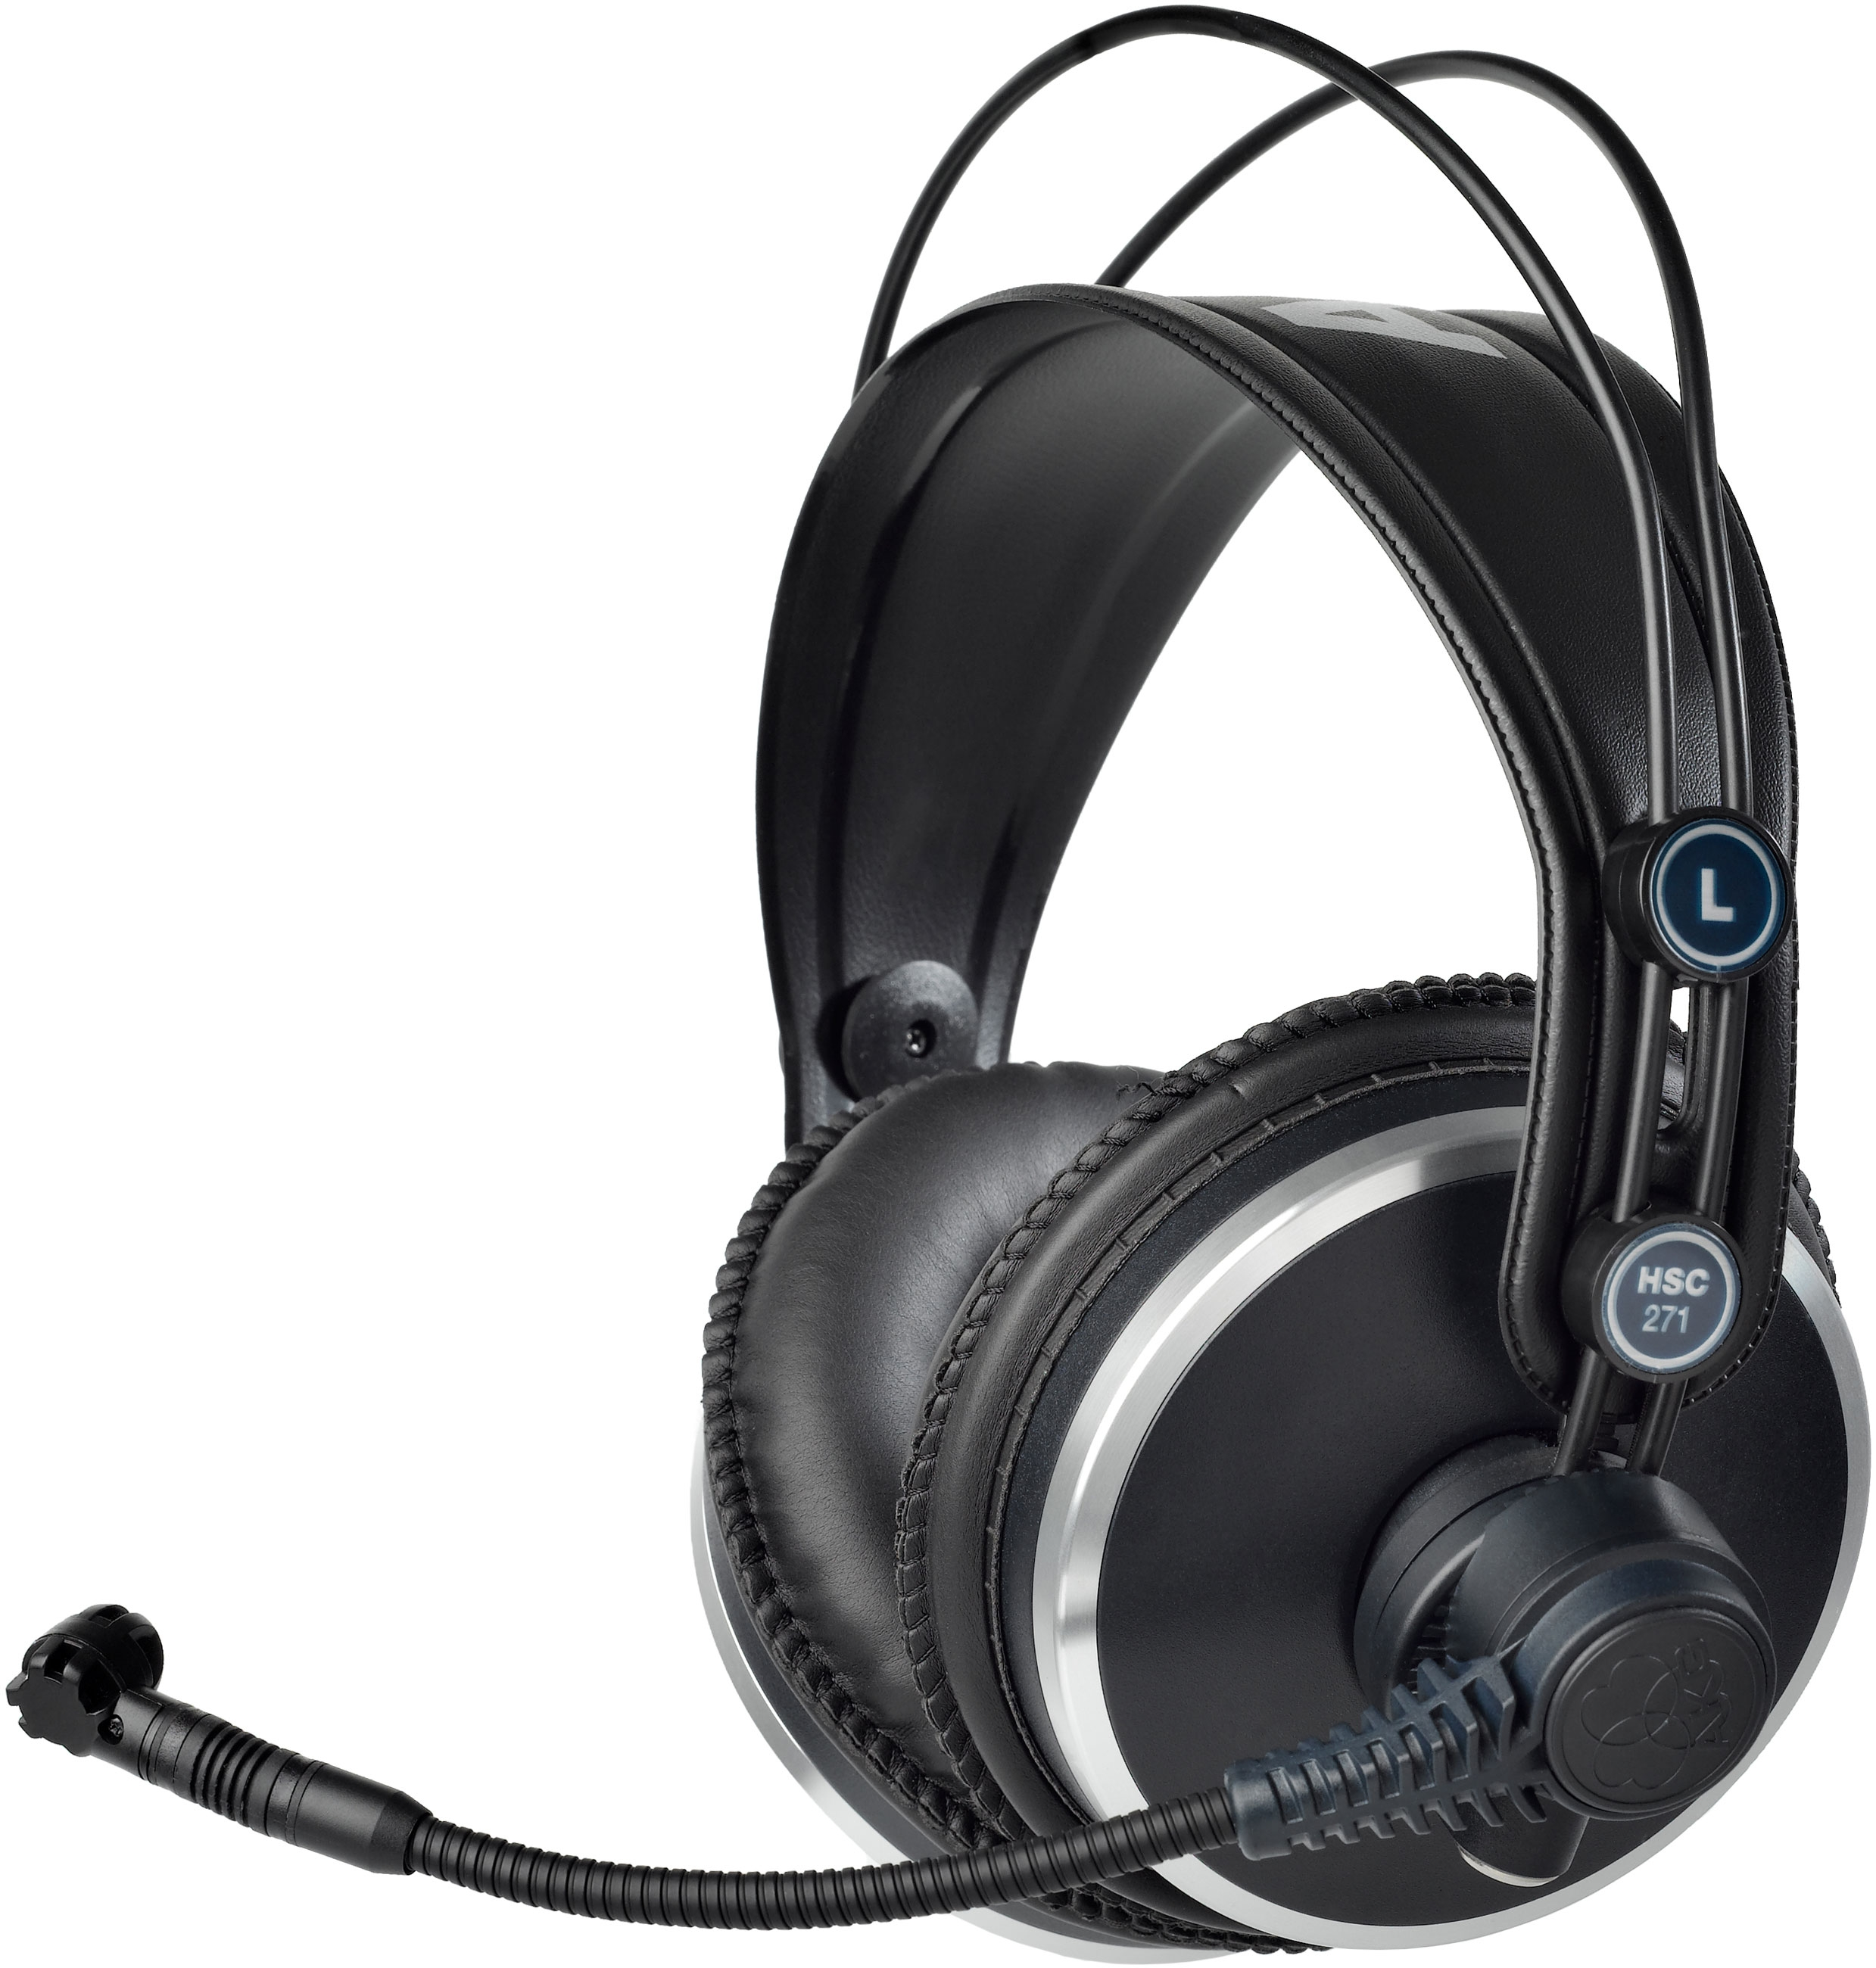 akg hsc217 professional headsets with condenser microphone ebay. Black Bedroom Furniture Sets. Home Design Ideas